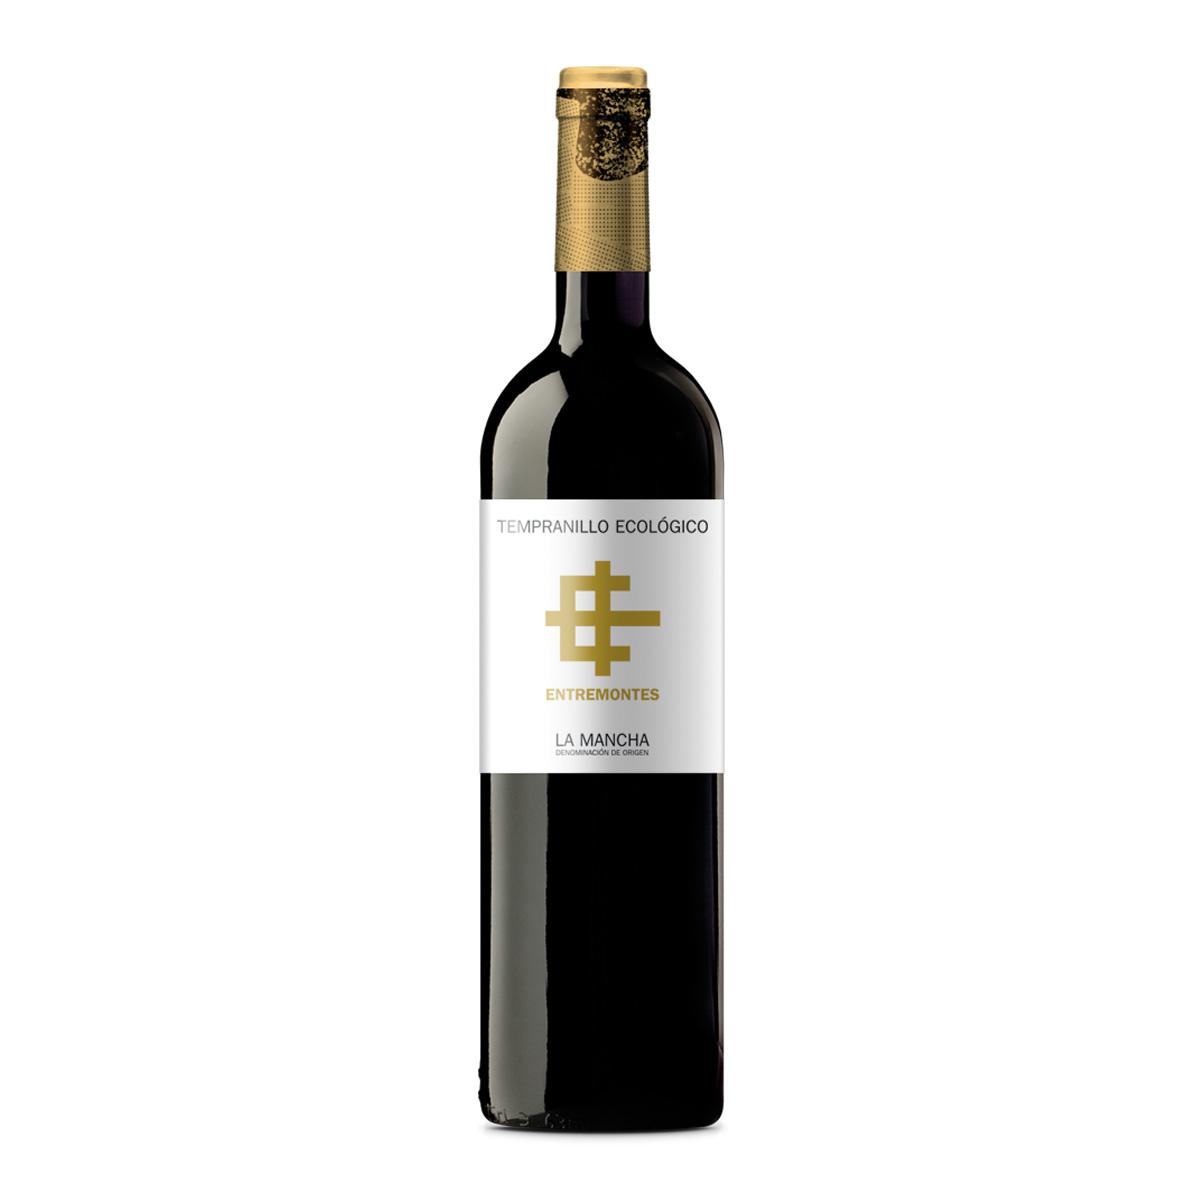 西班牙ENTREMONTES ORGANIC TEMPRANILLO有机丹魄干红葡萄酒